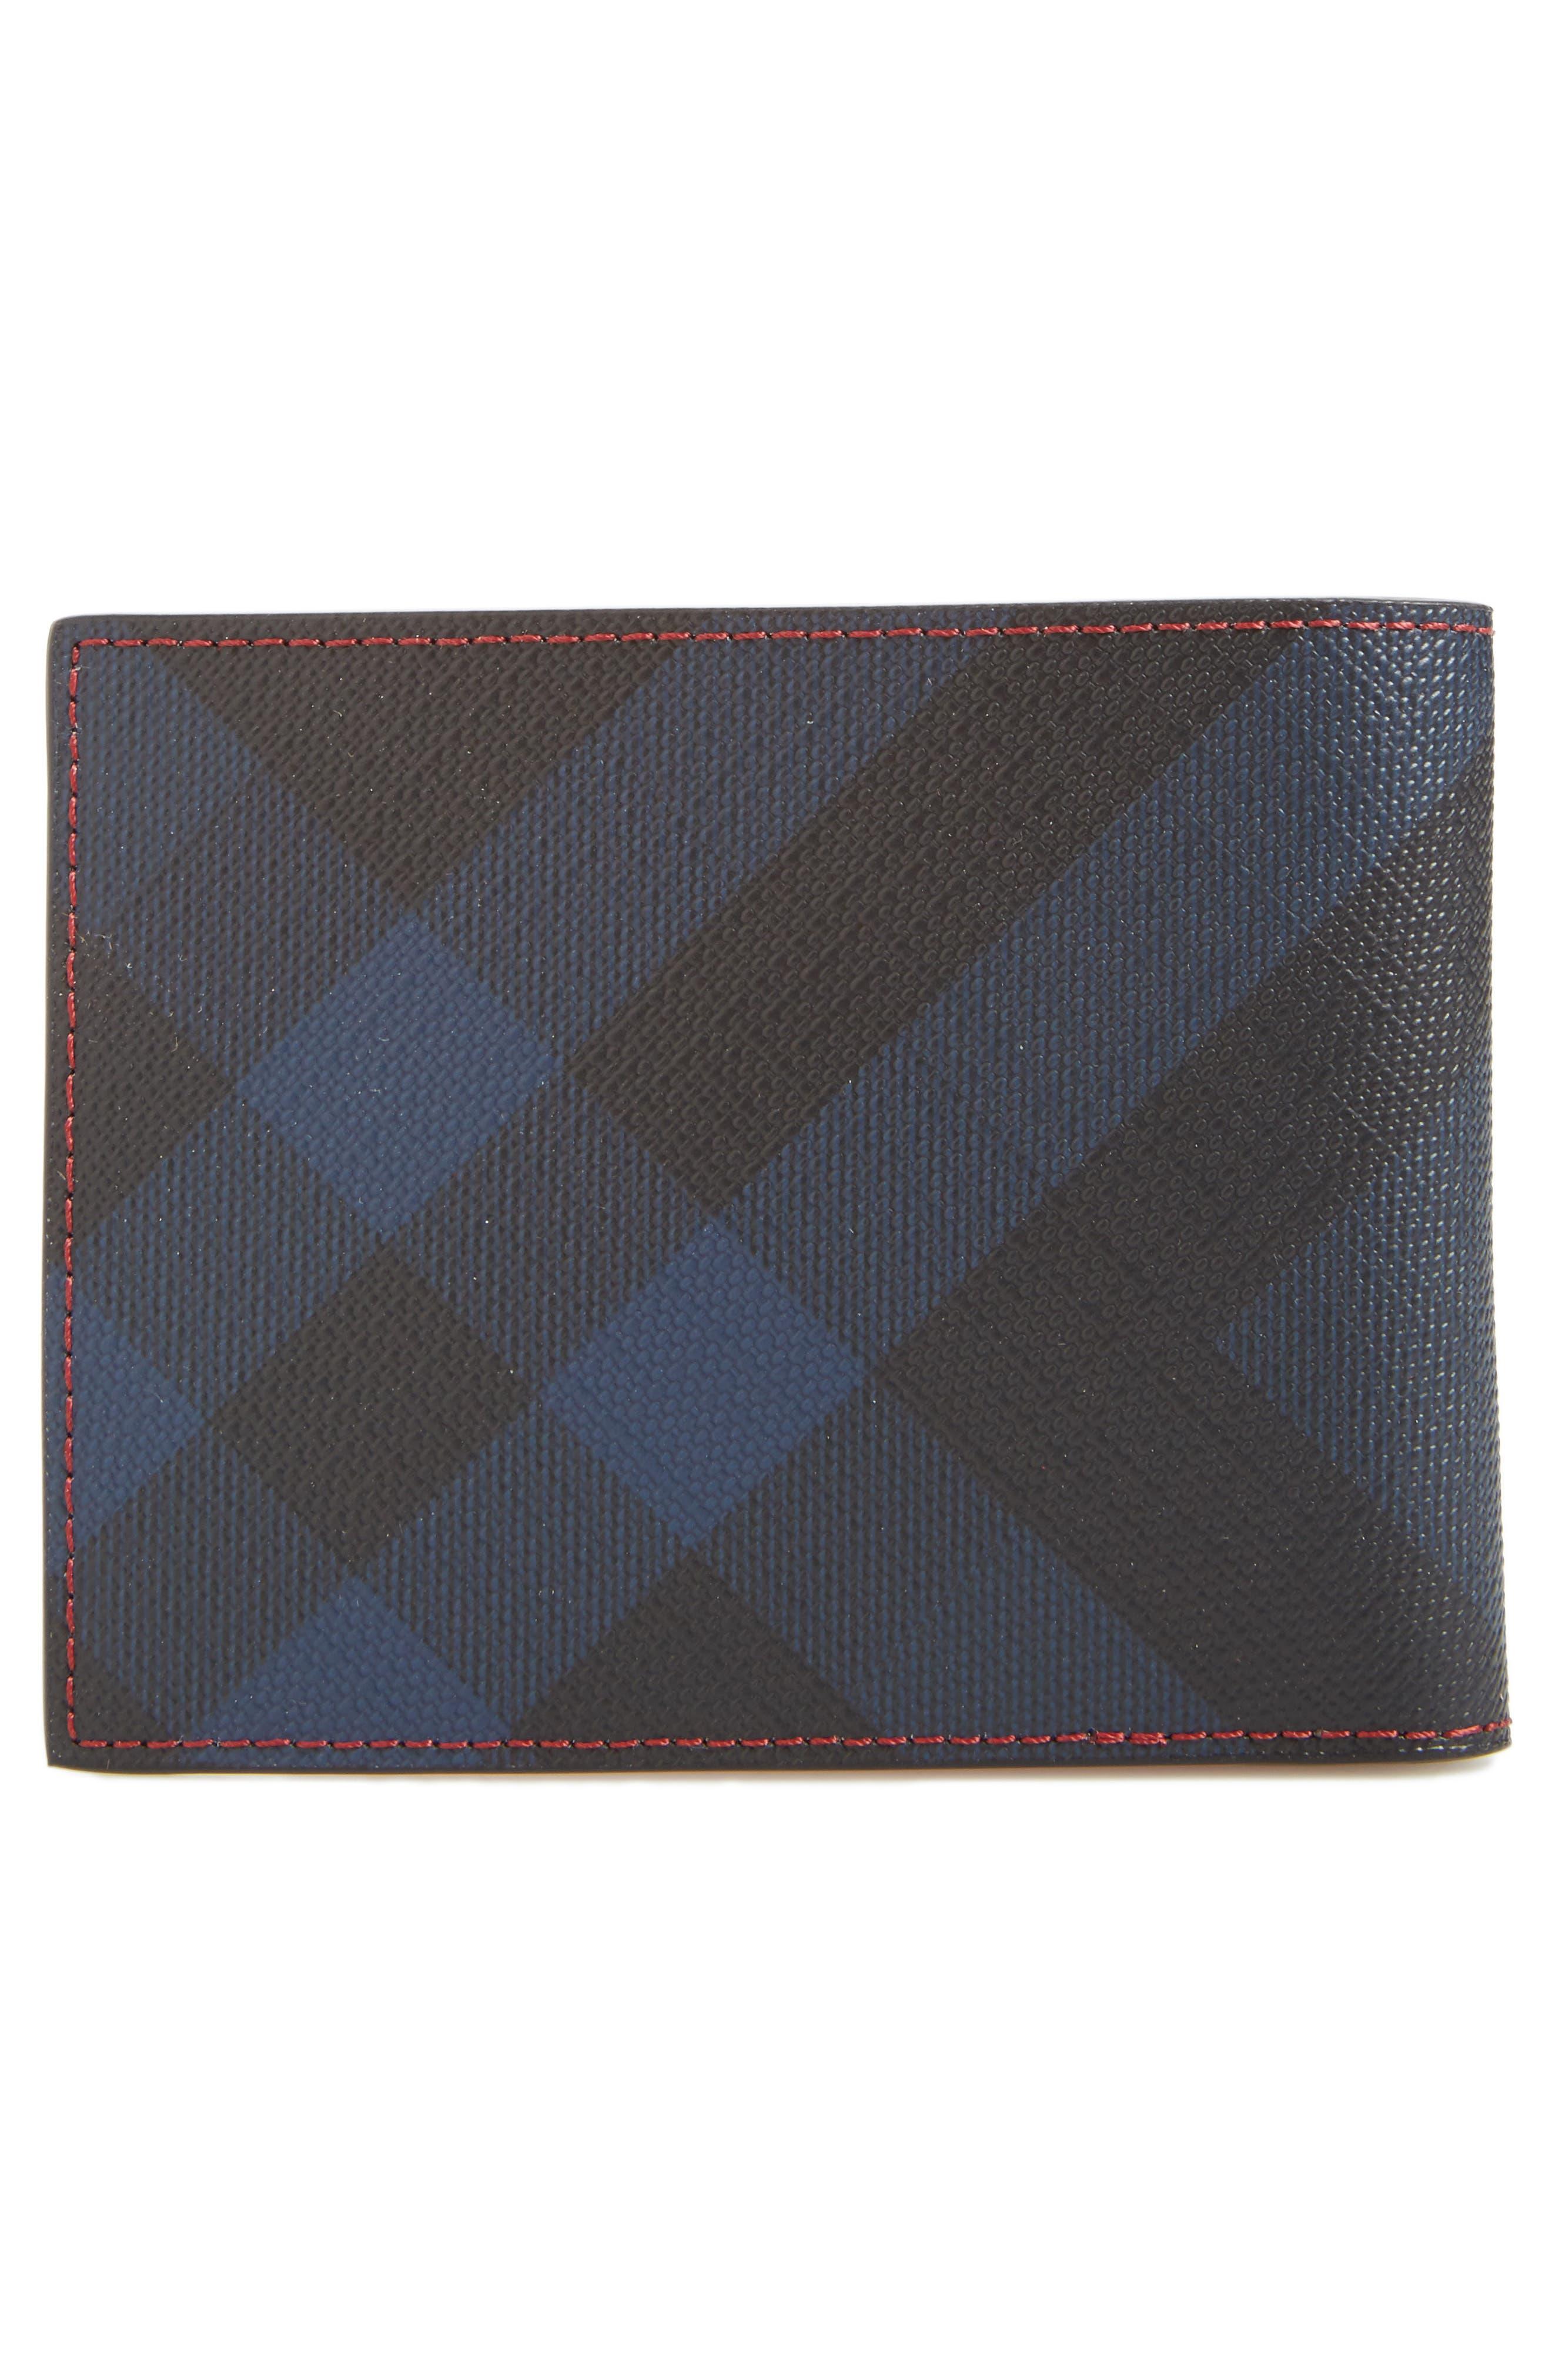 Sandon Wallet,                             Alternate thumbnail 3, color,                             604